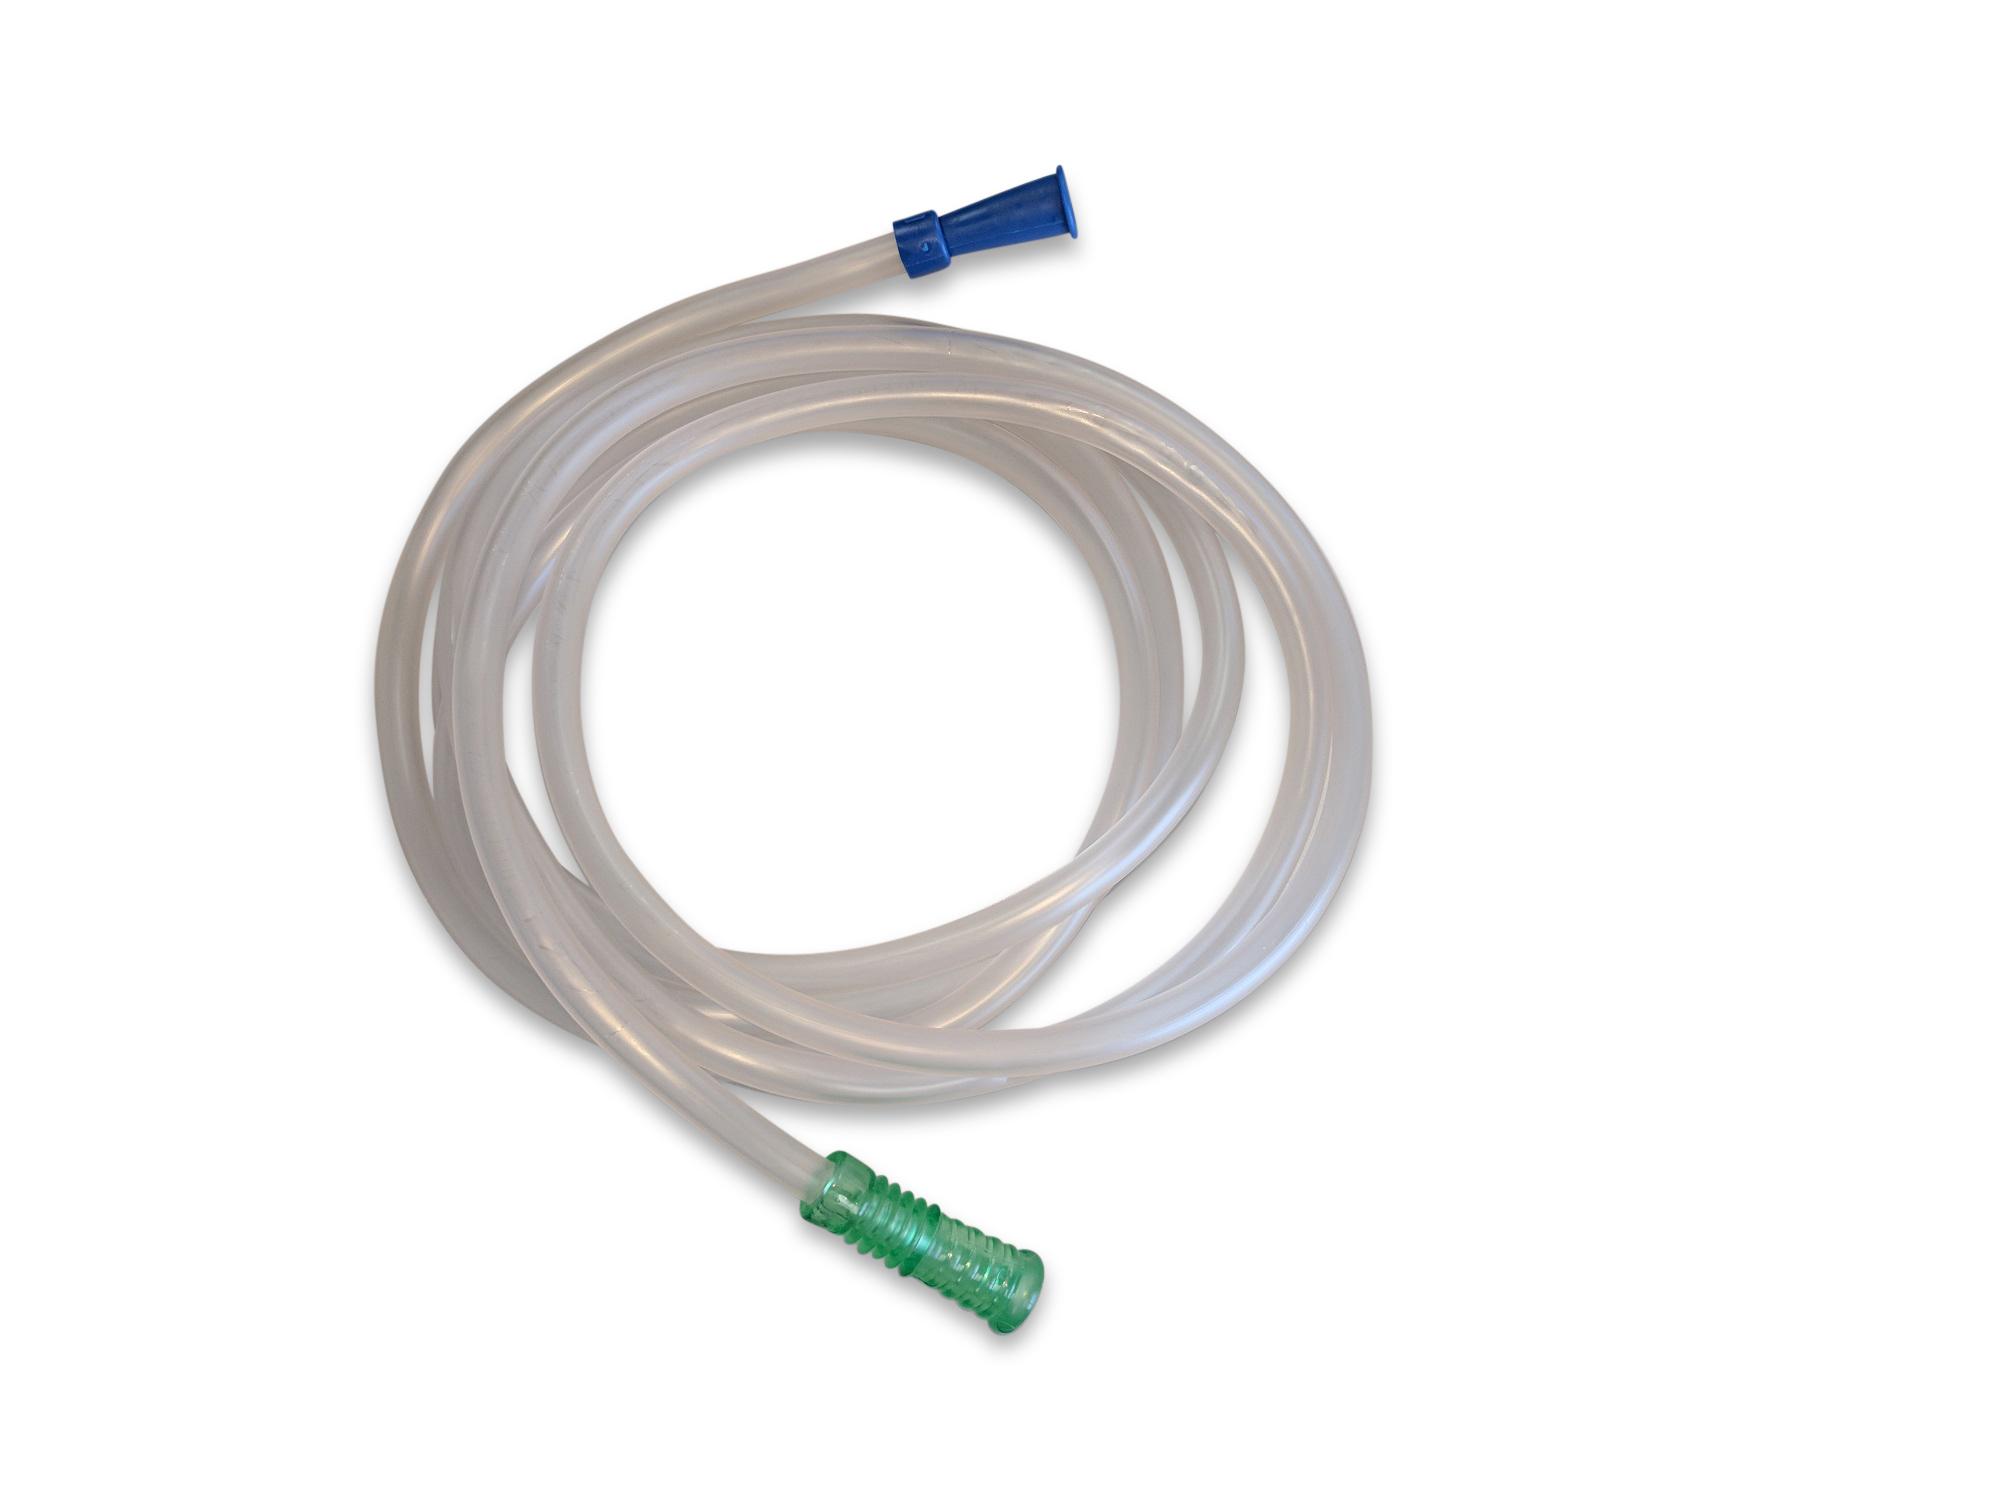 Zuigslang 270cm CH25 katheter + knik